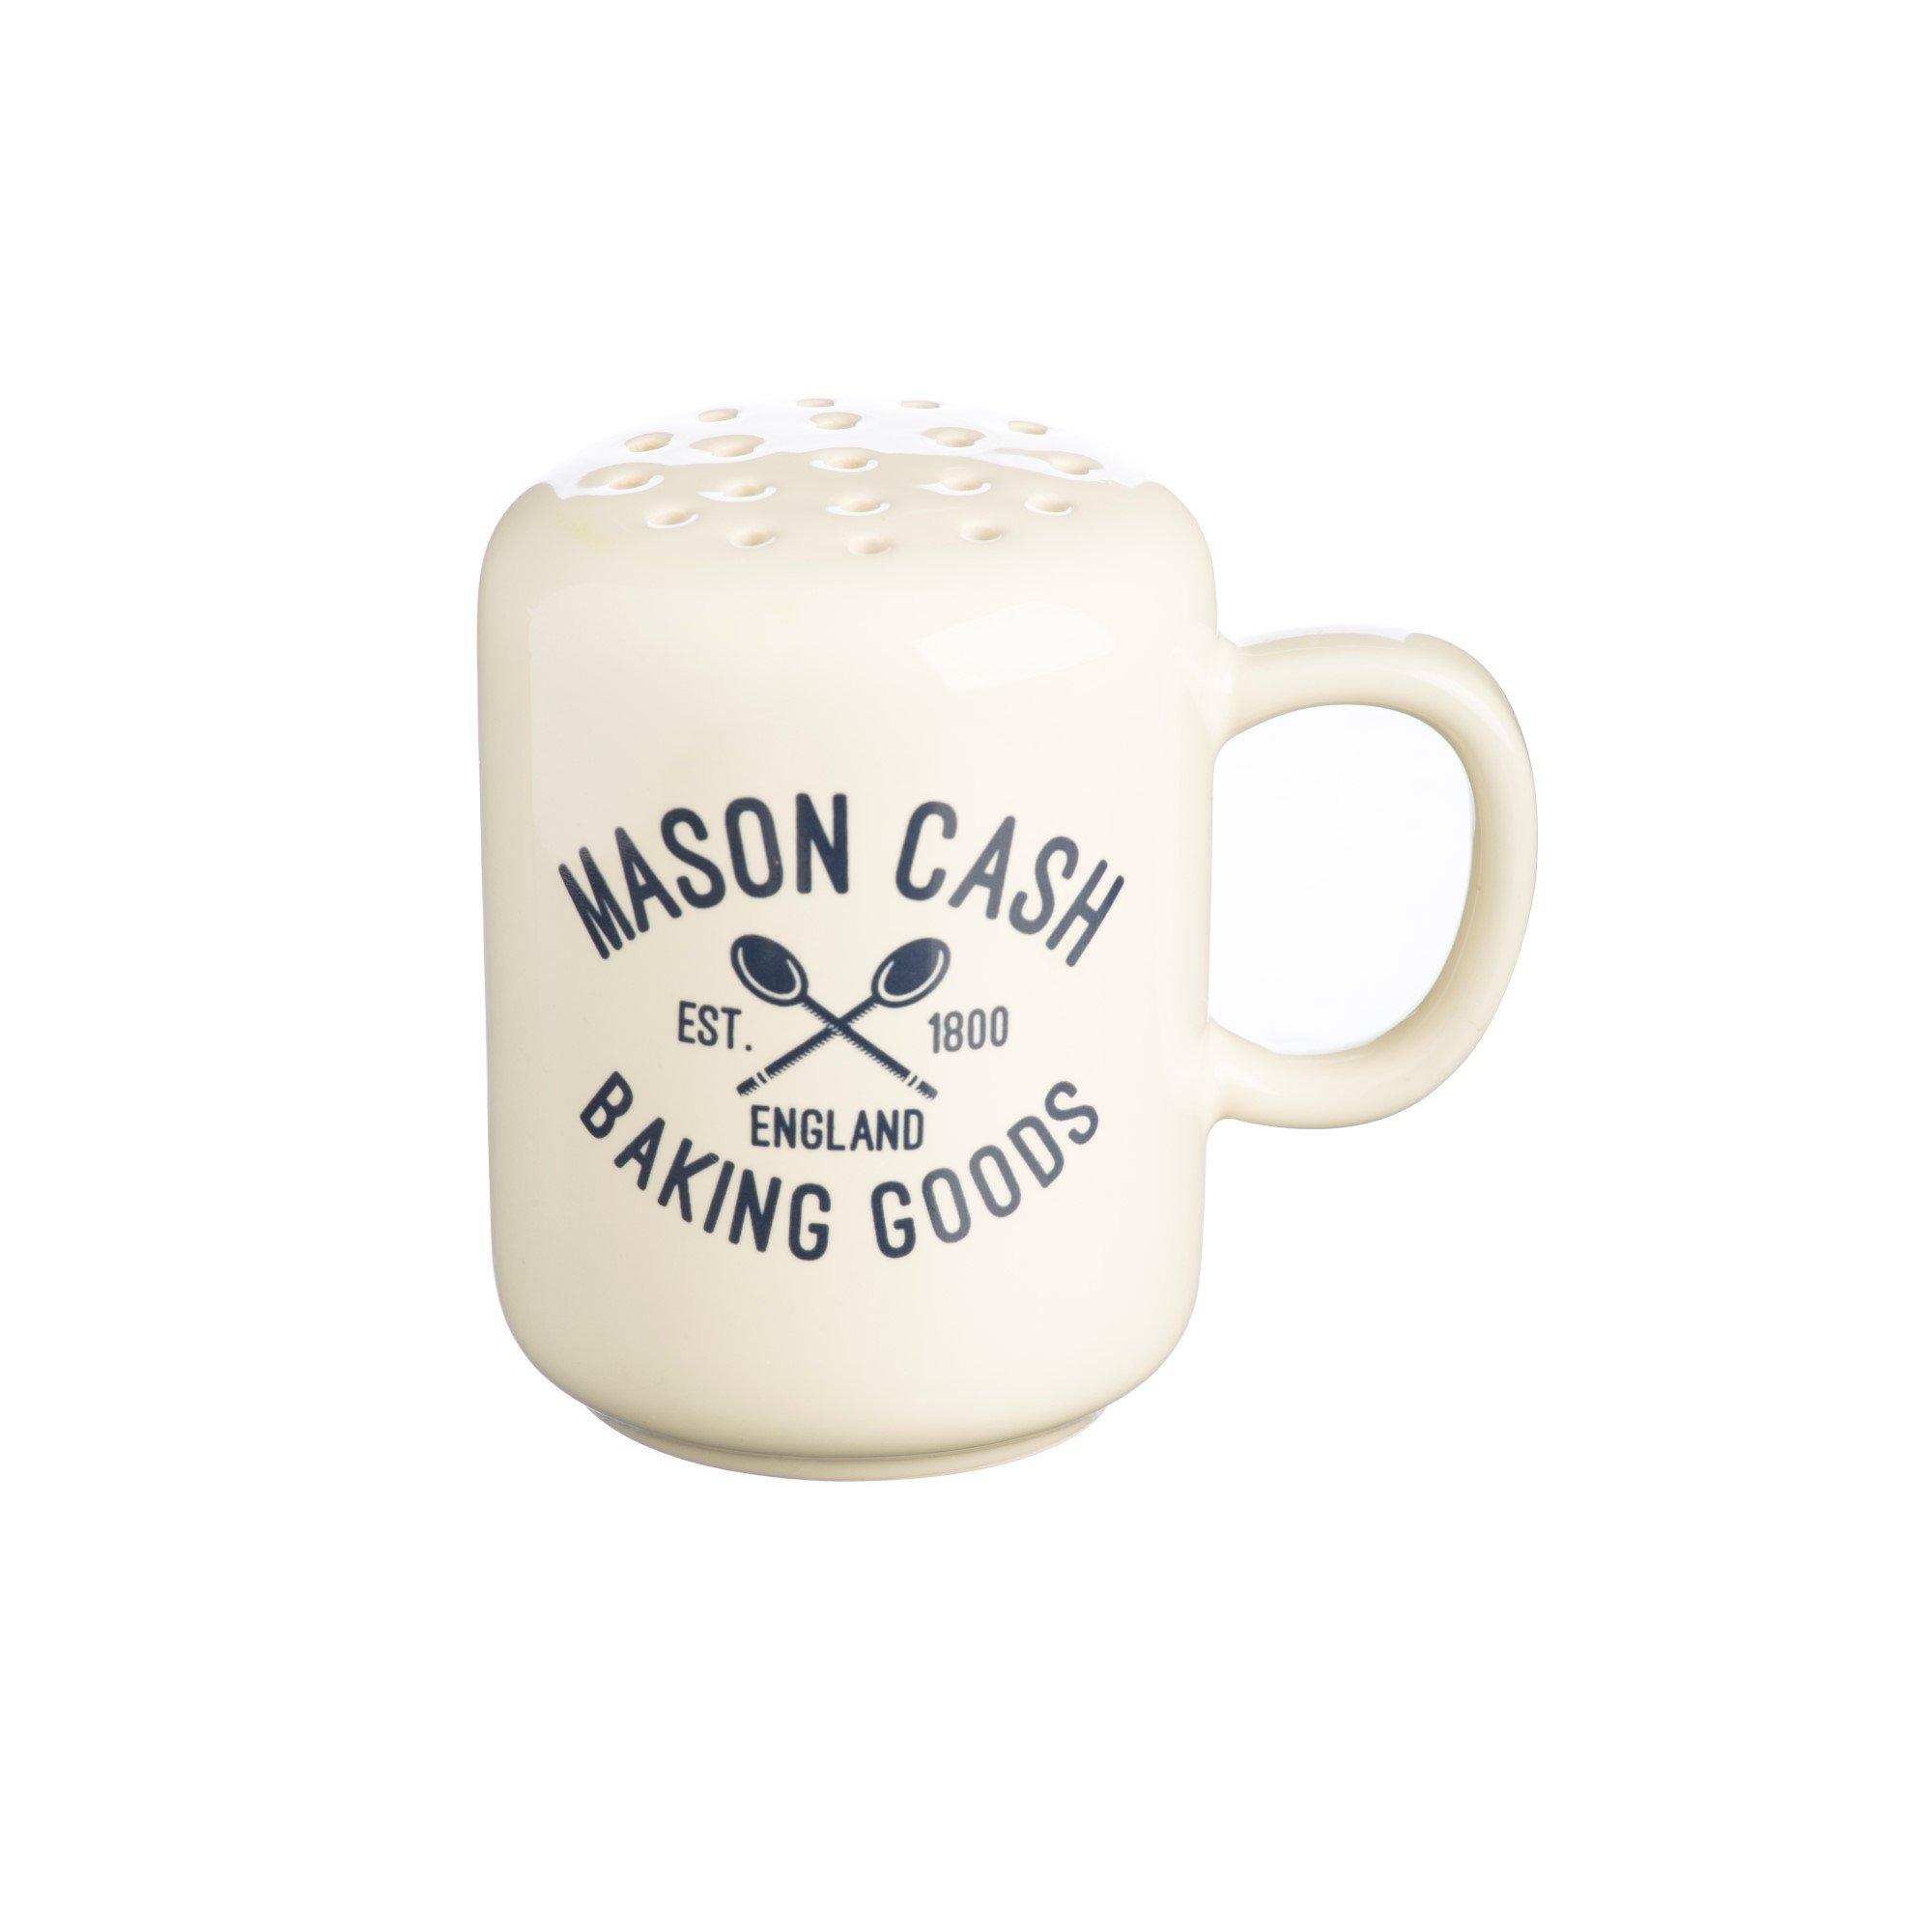 Mason Cash Varsity Ceramic Flour Shaker, 4-Ounces, Cream, Navy Blue